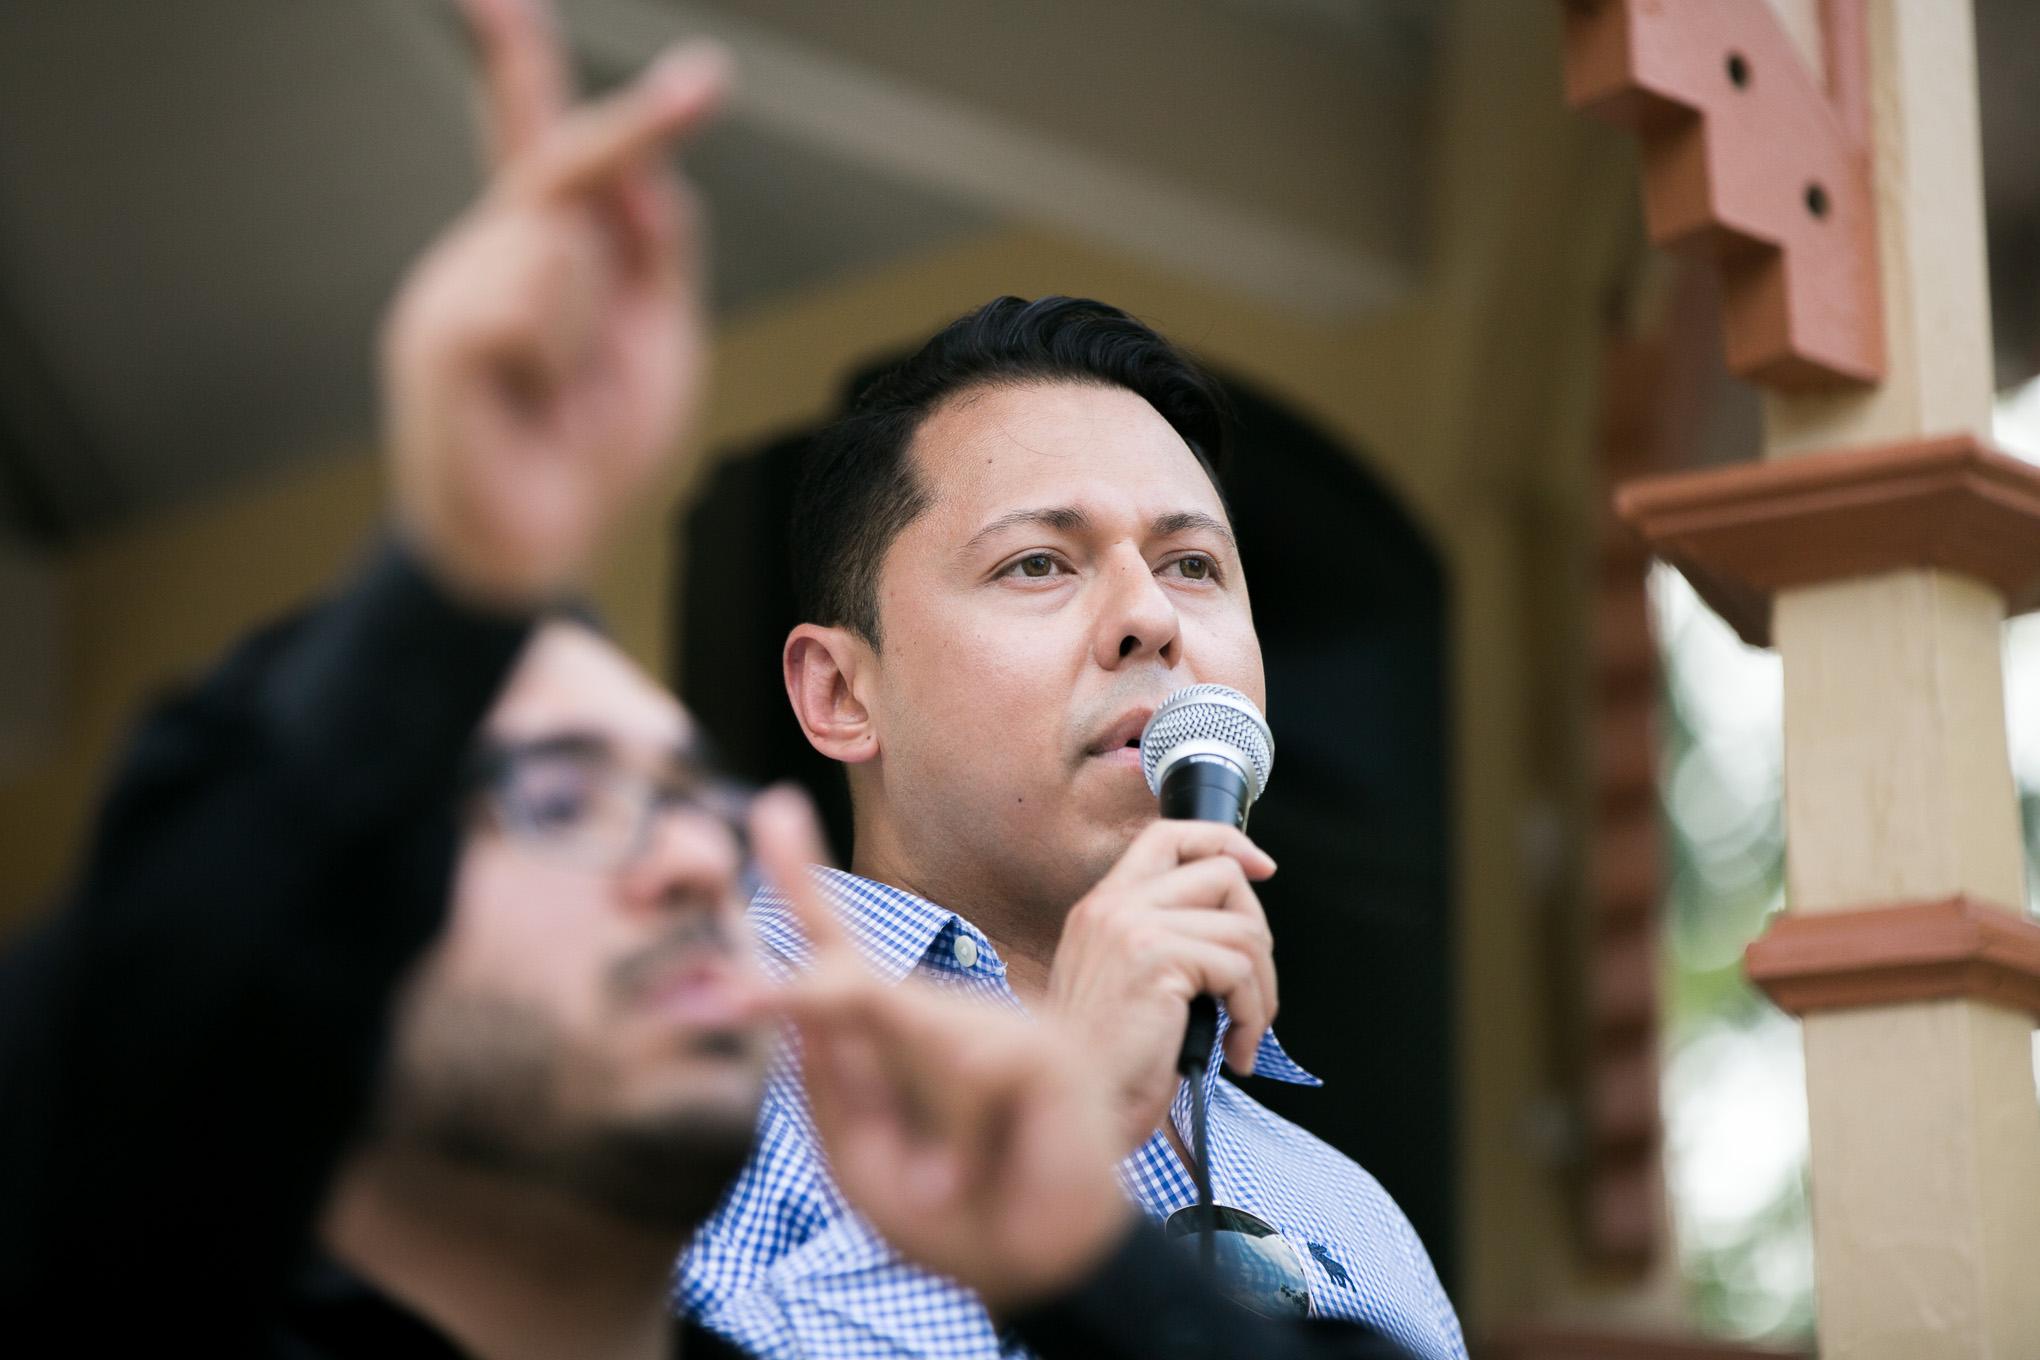 Equality Texas Vice Chair Julian Tovar speaks to the resiliance of San Antonio's LBGTQIA community. Photo by Kathryn Boyd-Batstone.